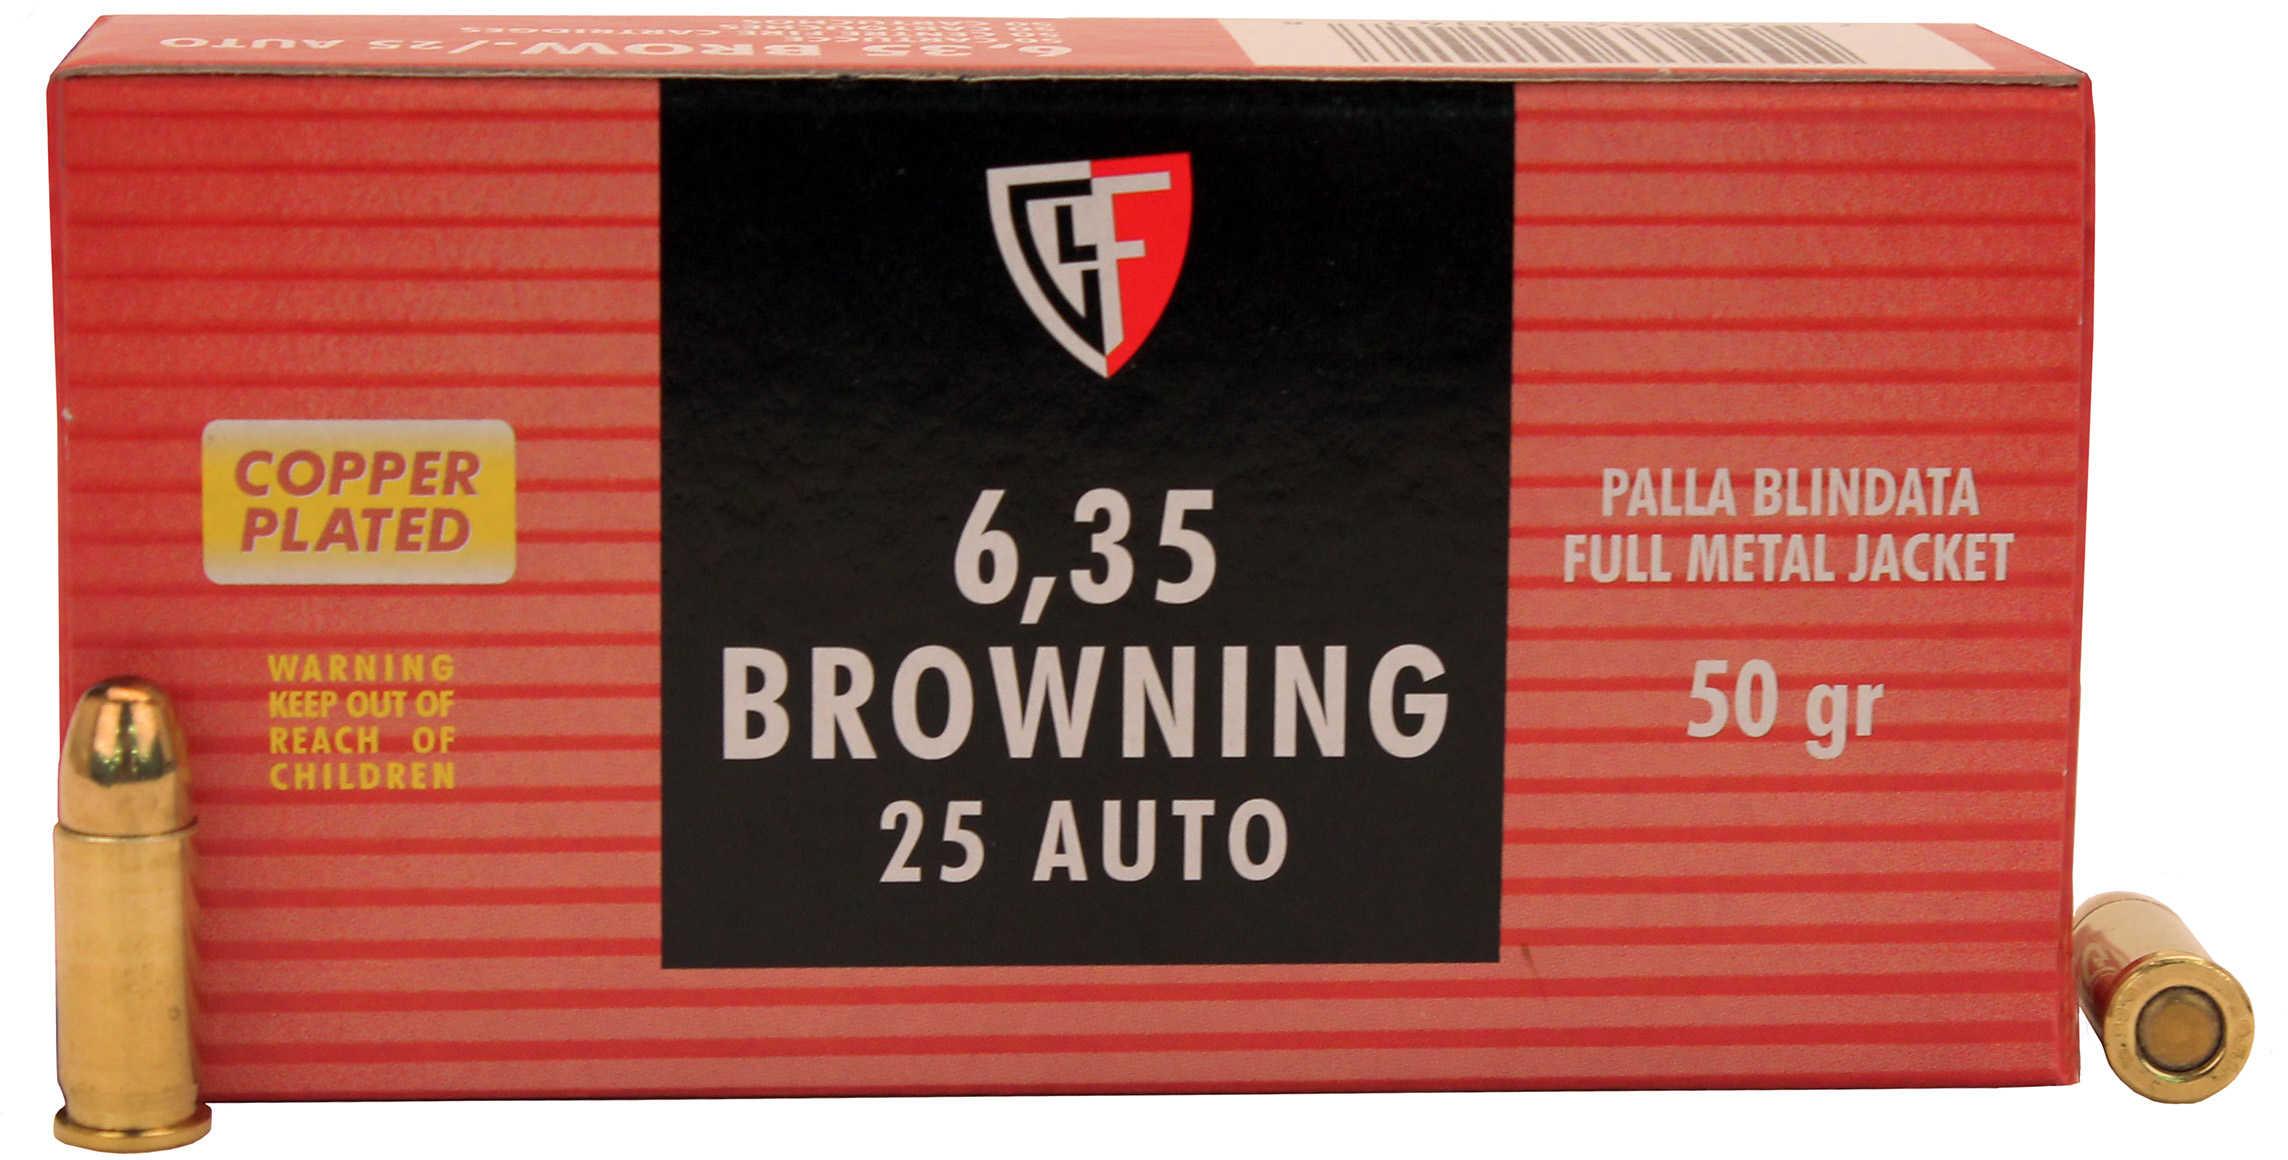 Fiocchi Ammunition Centerfire Pistol 25 ACP 50 Grain Full Metal Jacket 50 Round Box 25AP